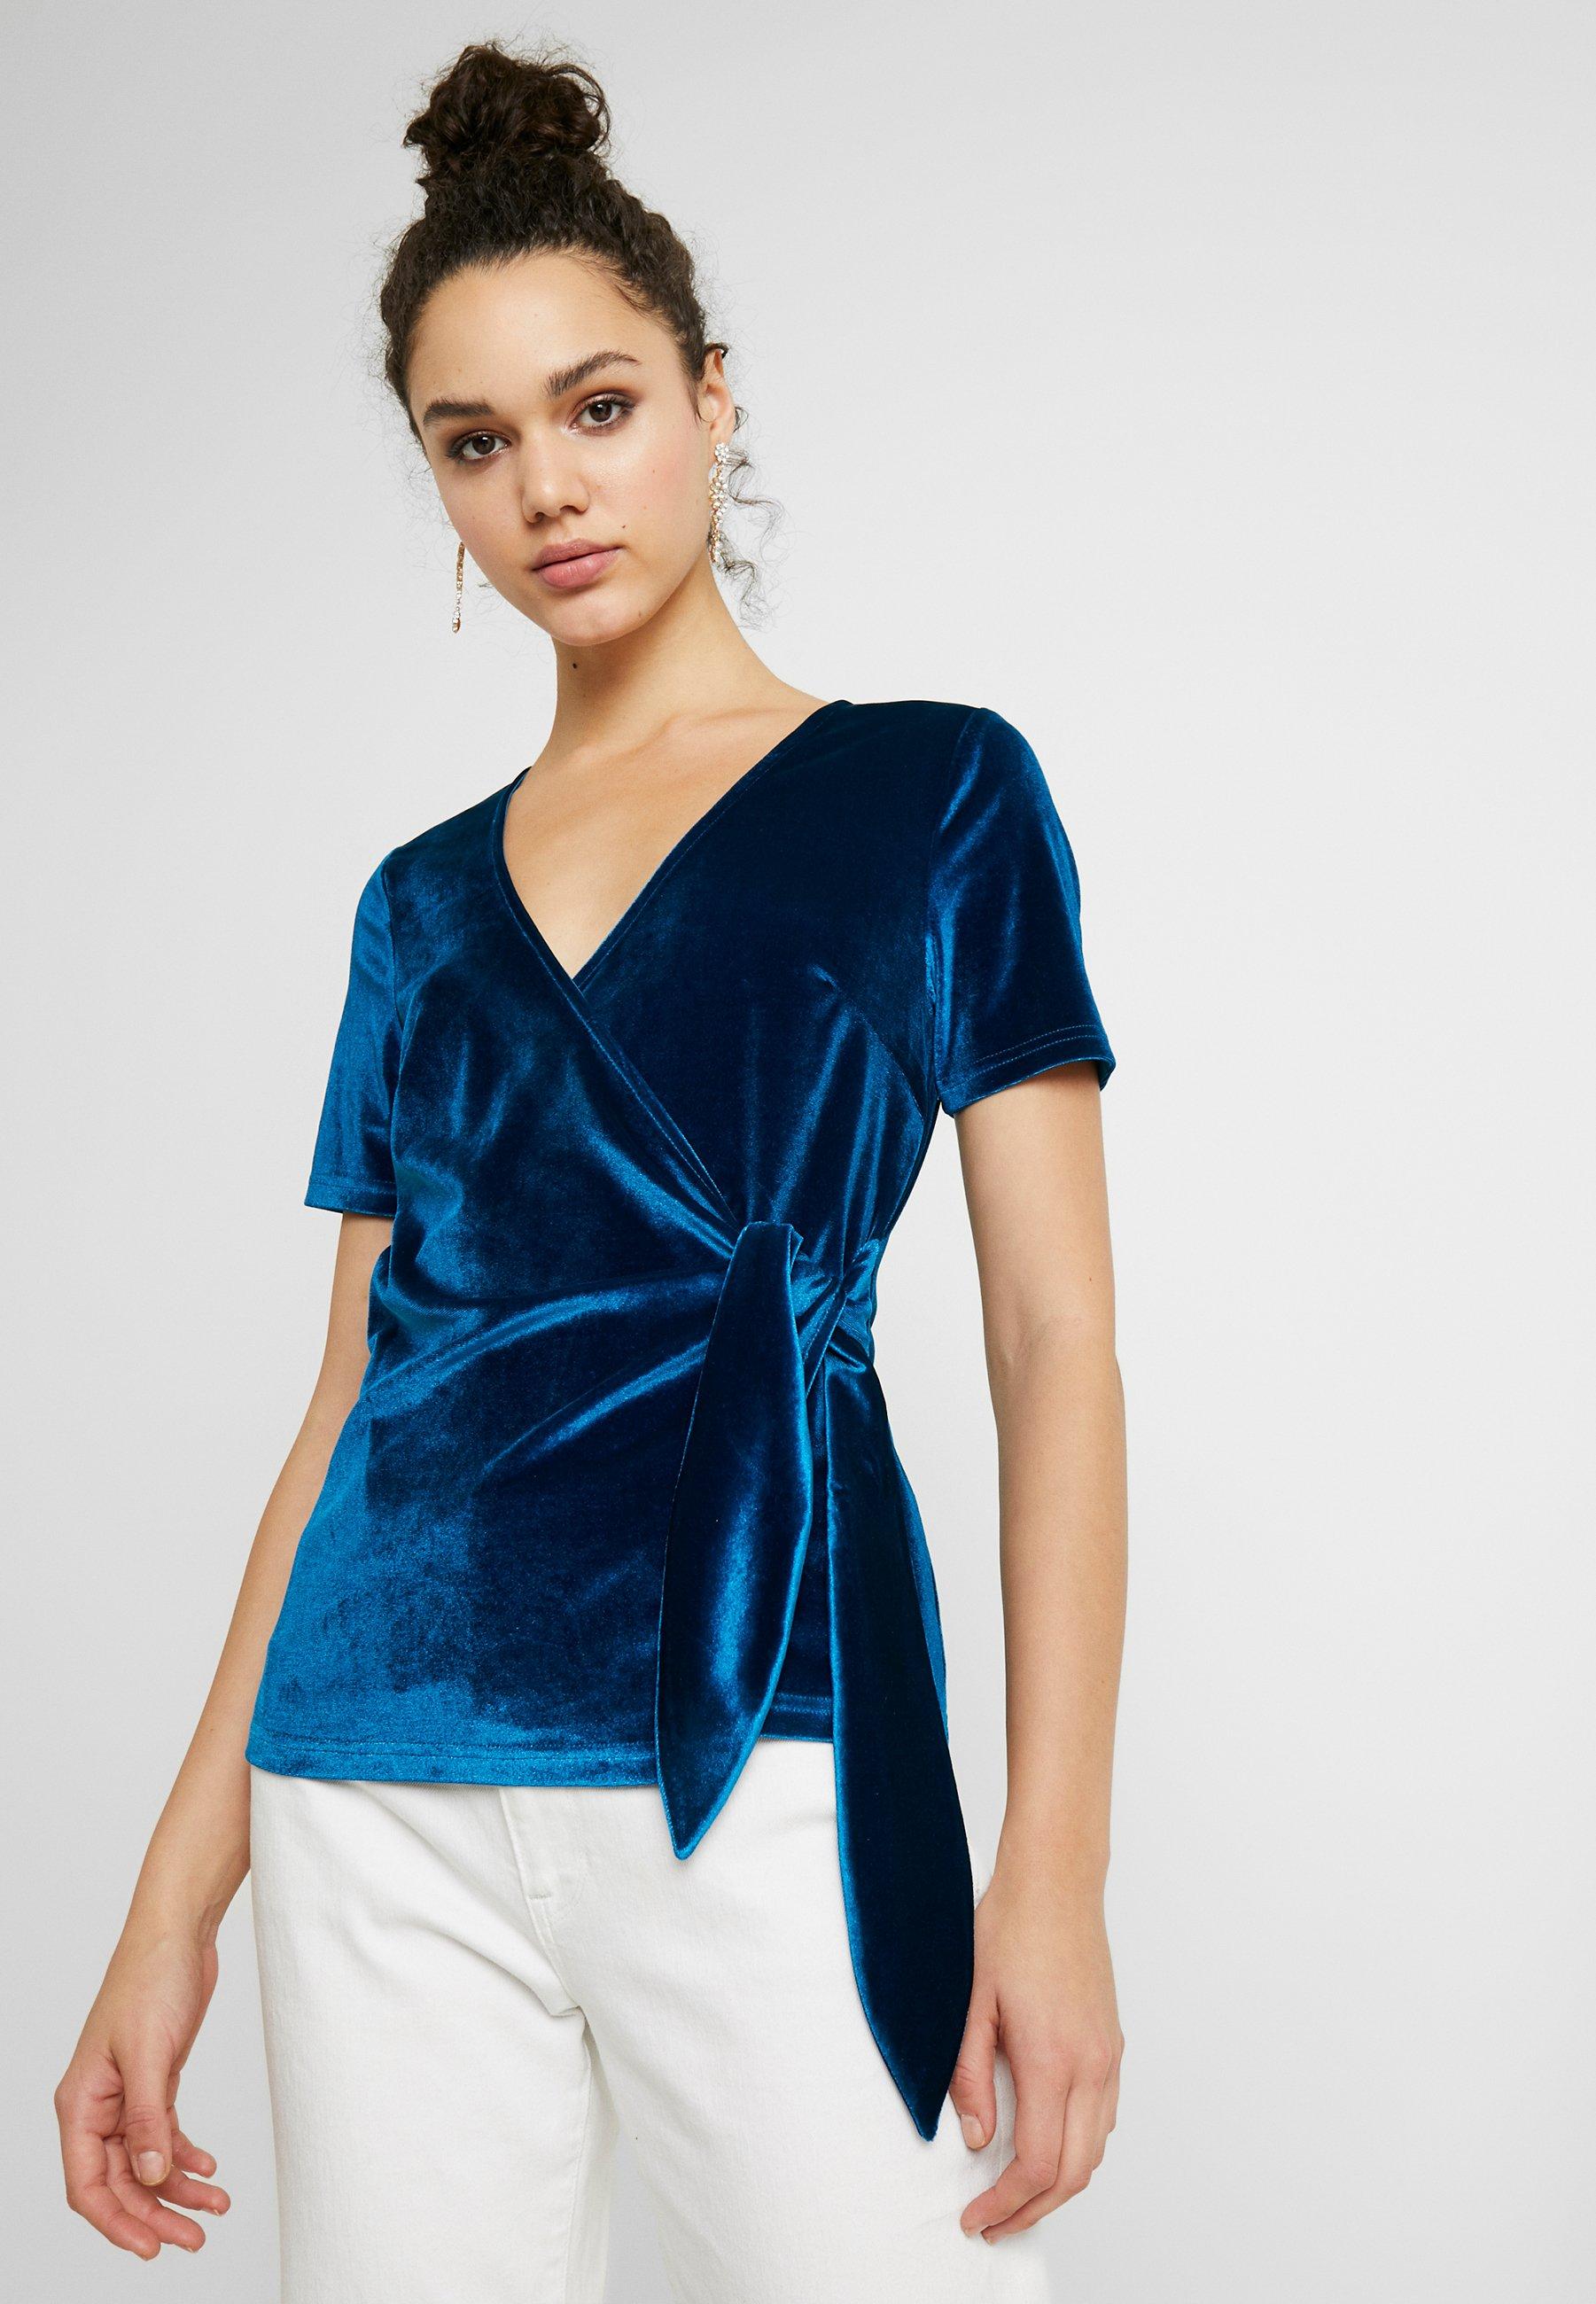 T Union Con shirt Fashion Blue Stampa LSzVMUGqp